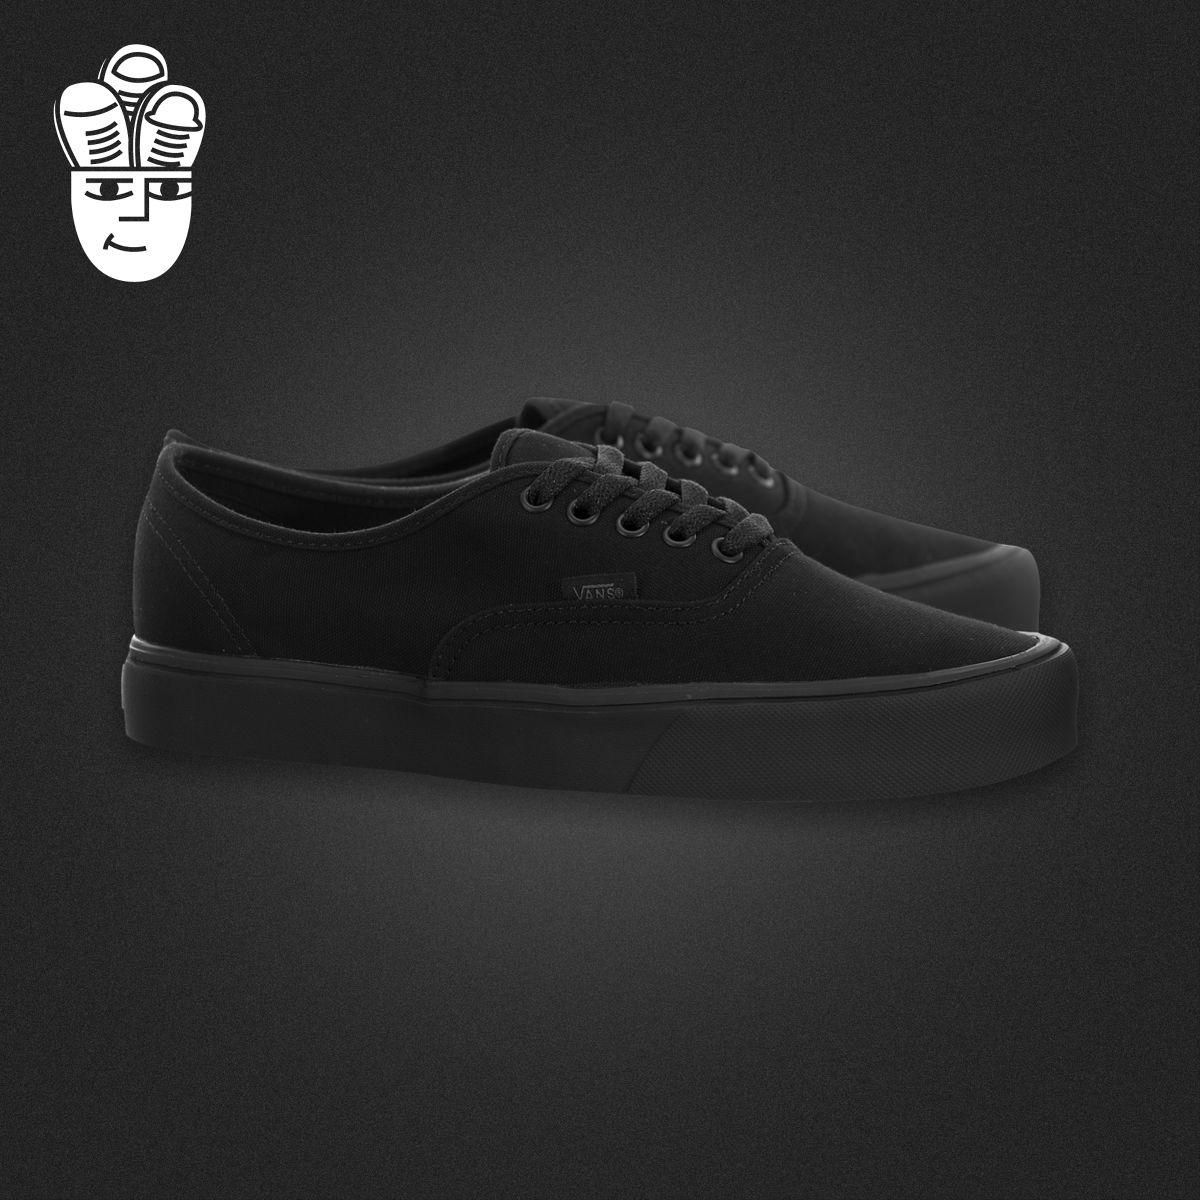 Vans Authentic Lite 范斯男鞋 经典款 低帮休闲板鞋 帆